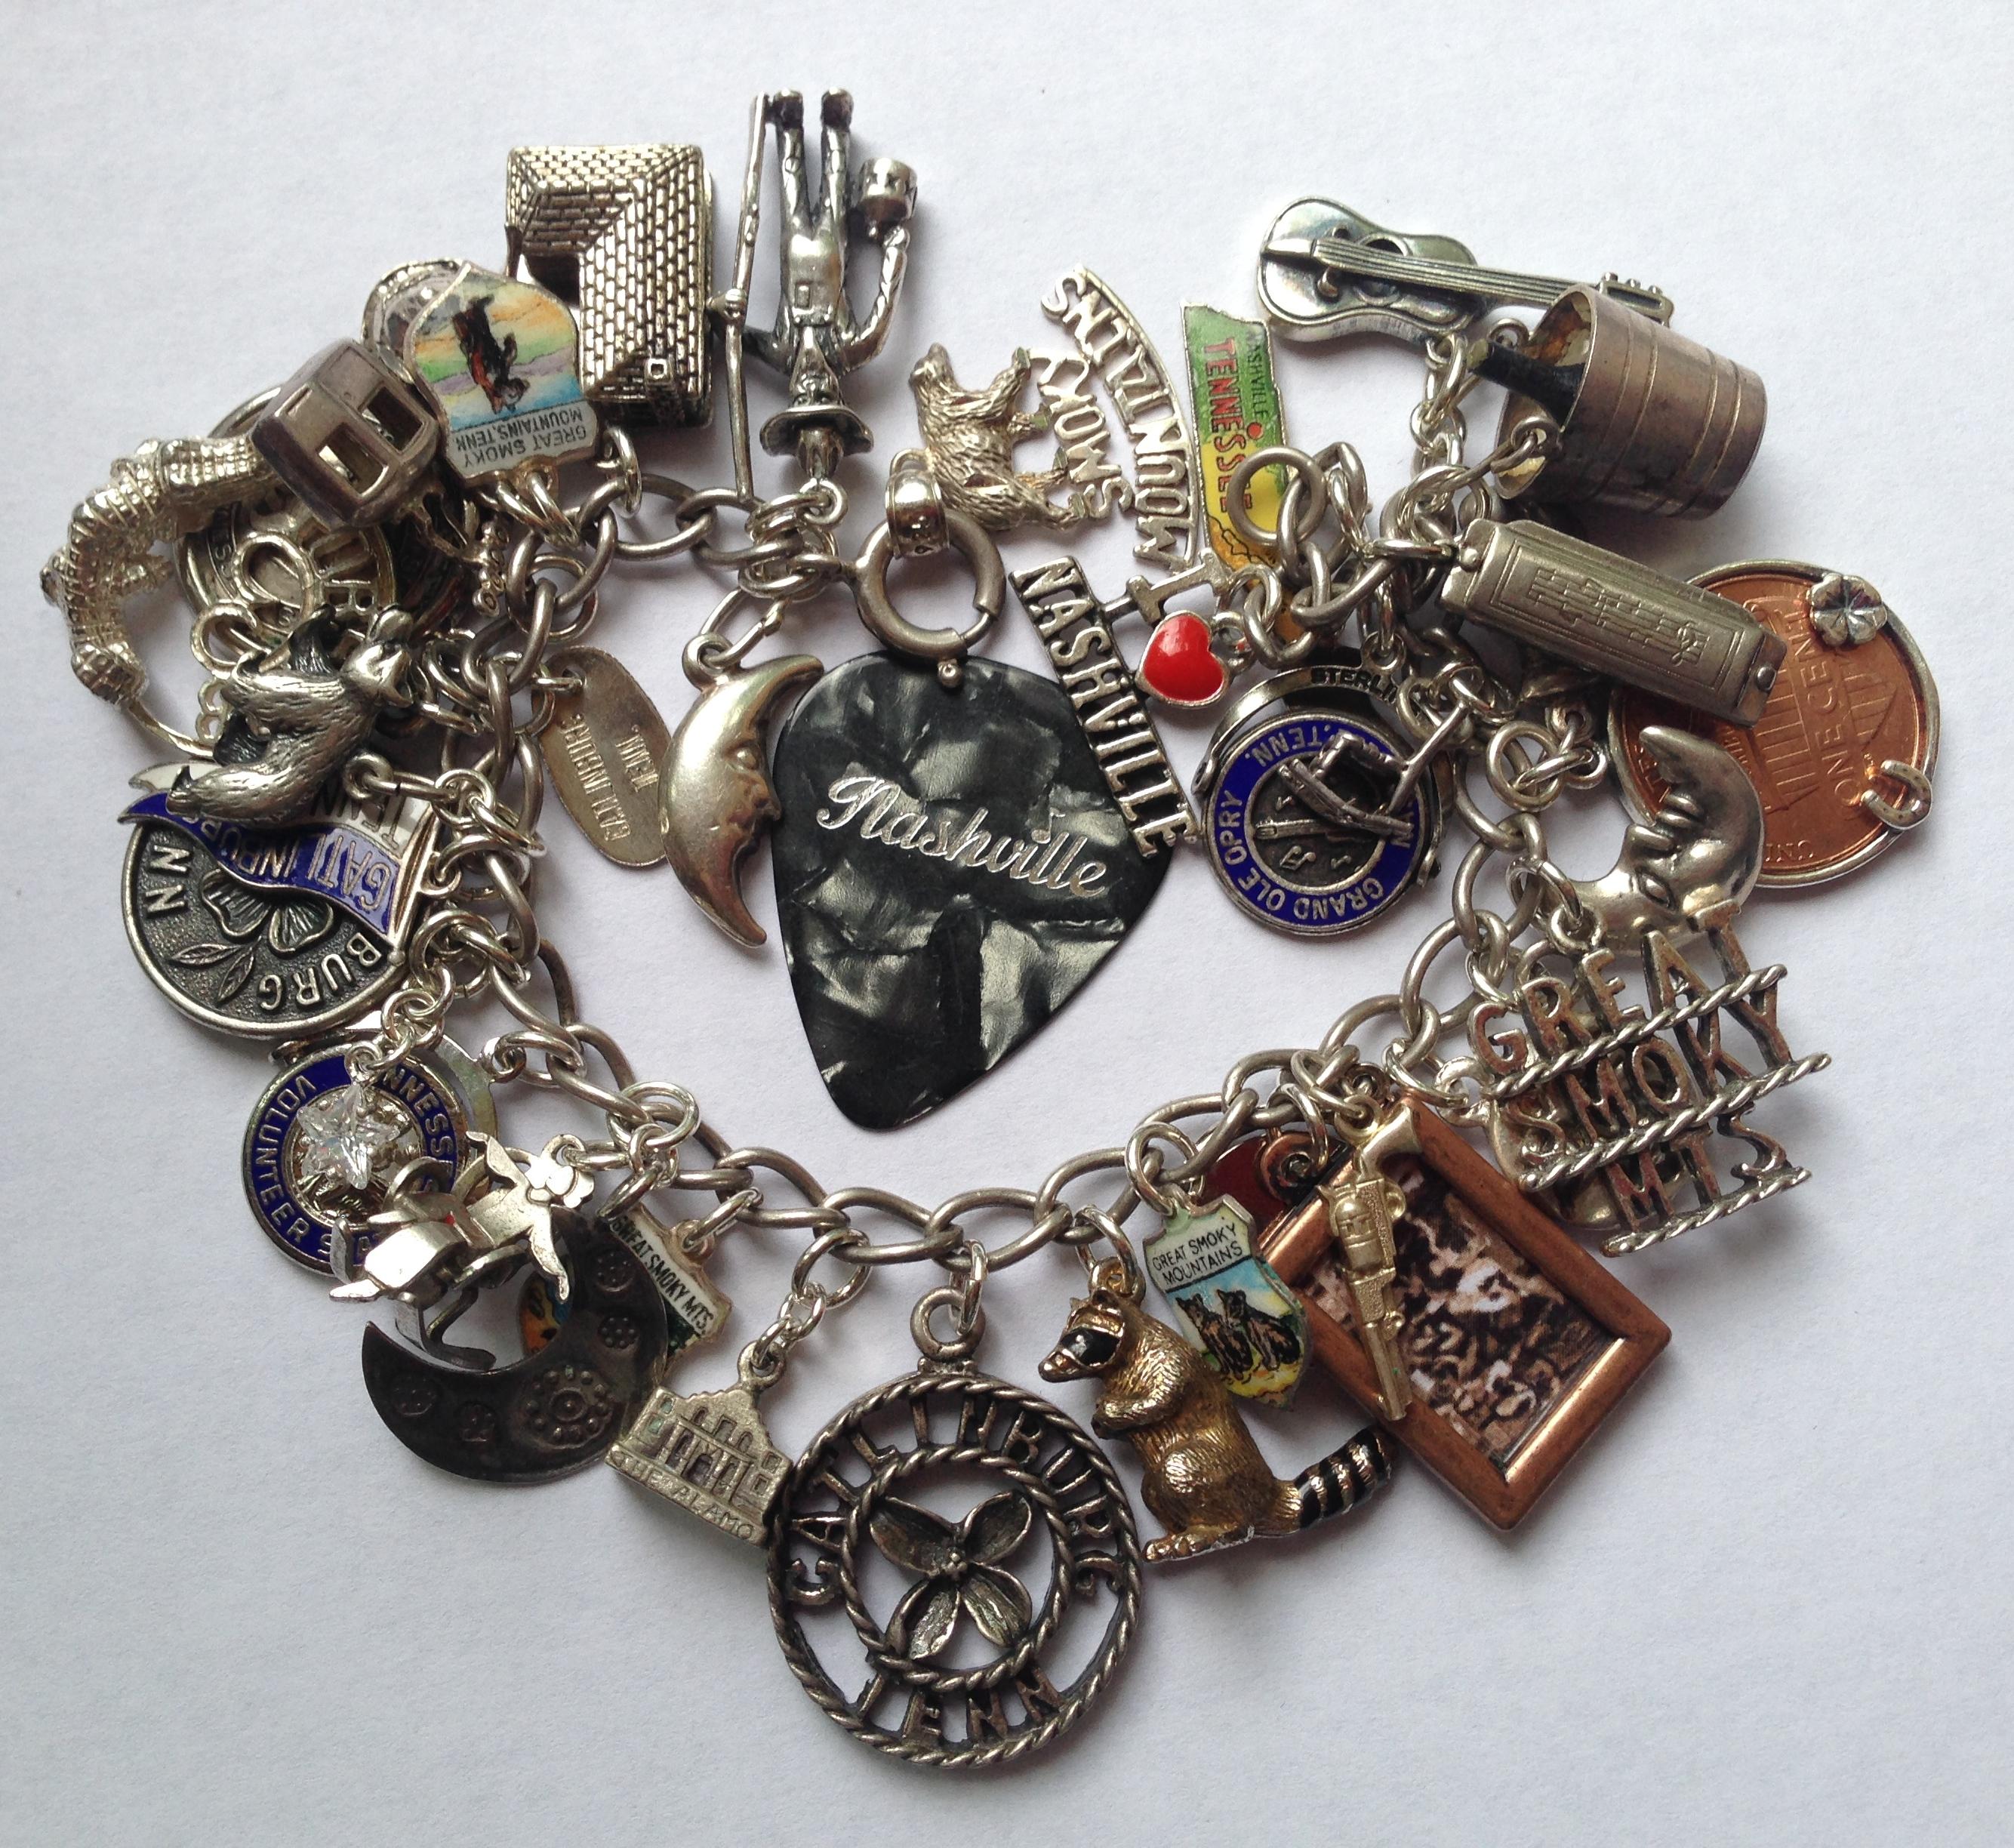 eCharmony Charm Bracelet Collection Smoky Mountains Charm